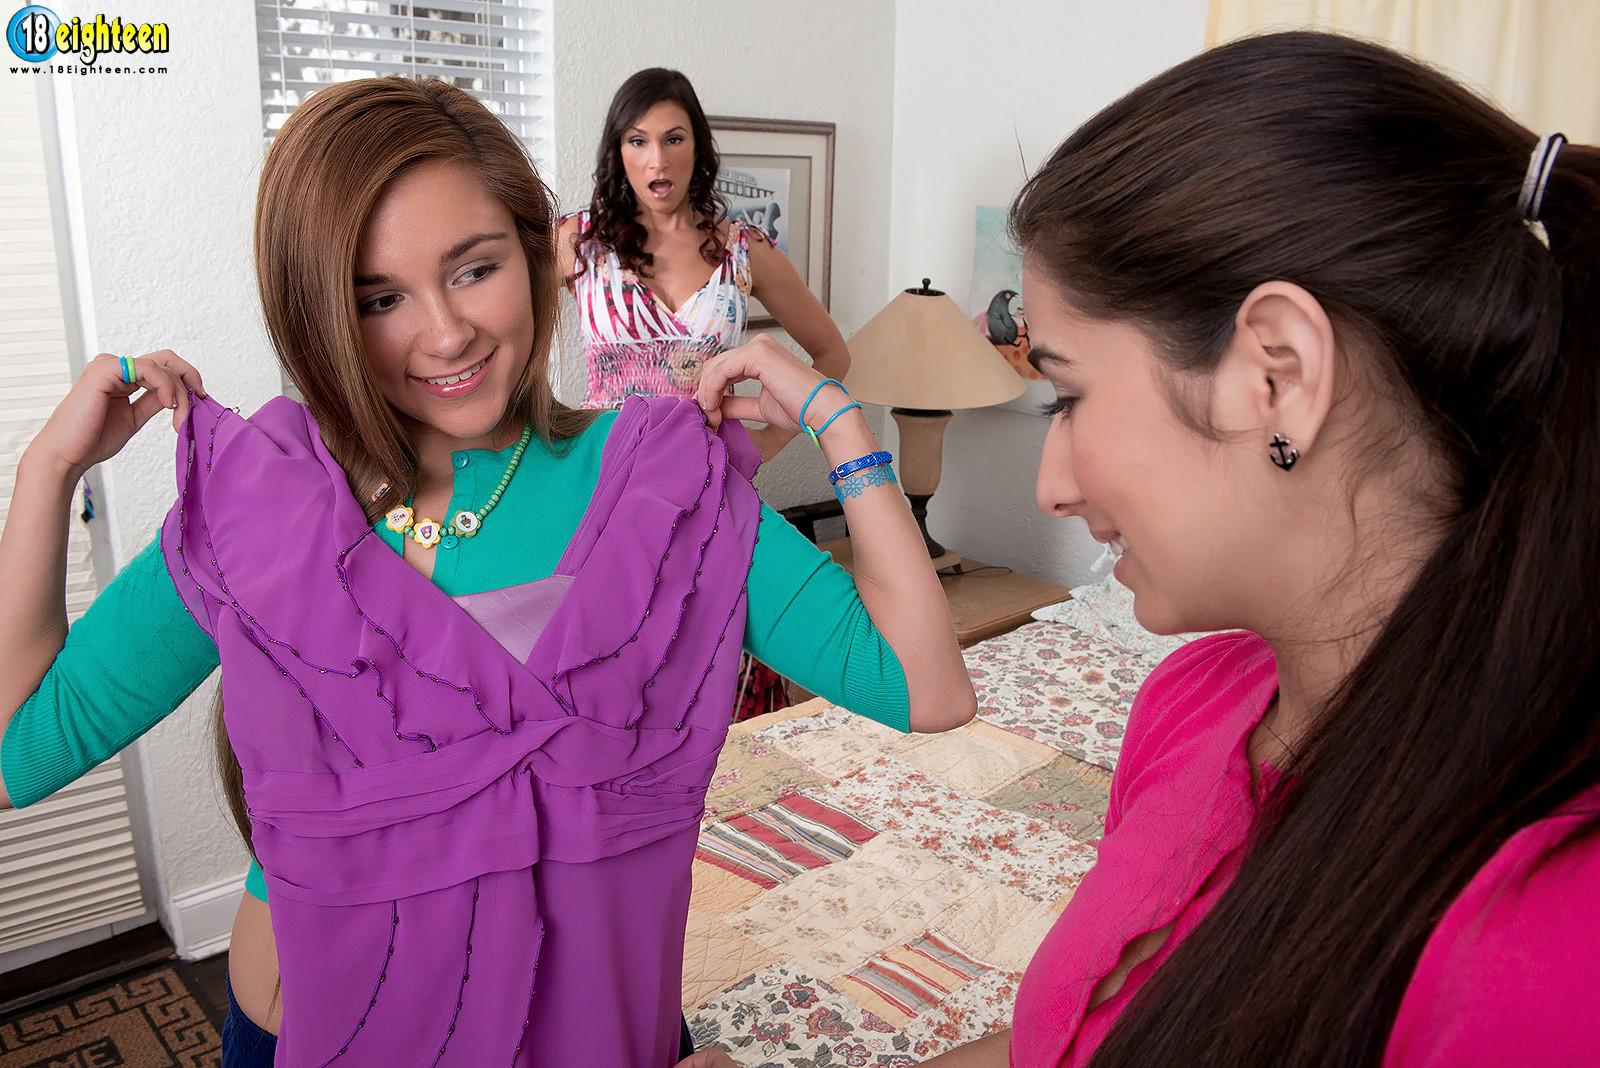 Megan Salinas, Raven Lechance, Zoey Foxx - Галерея 3448142